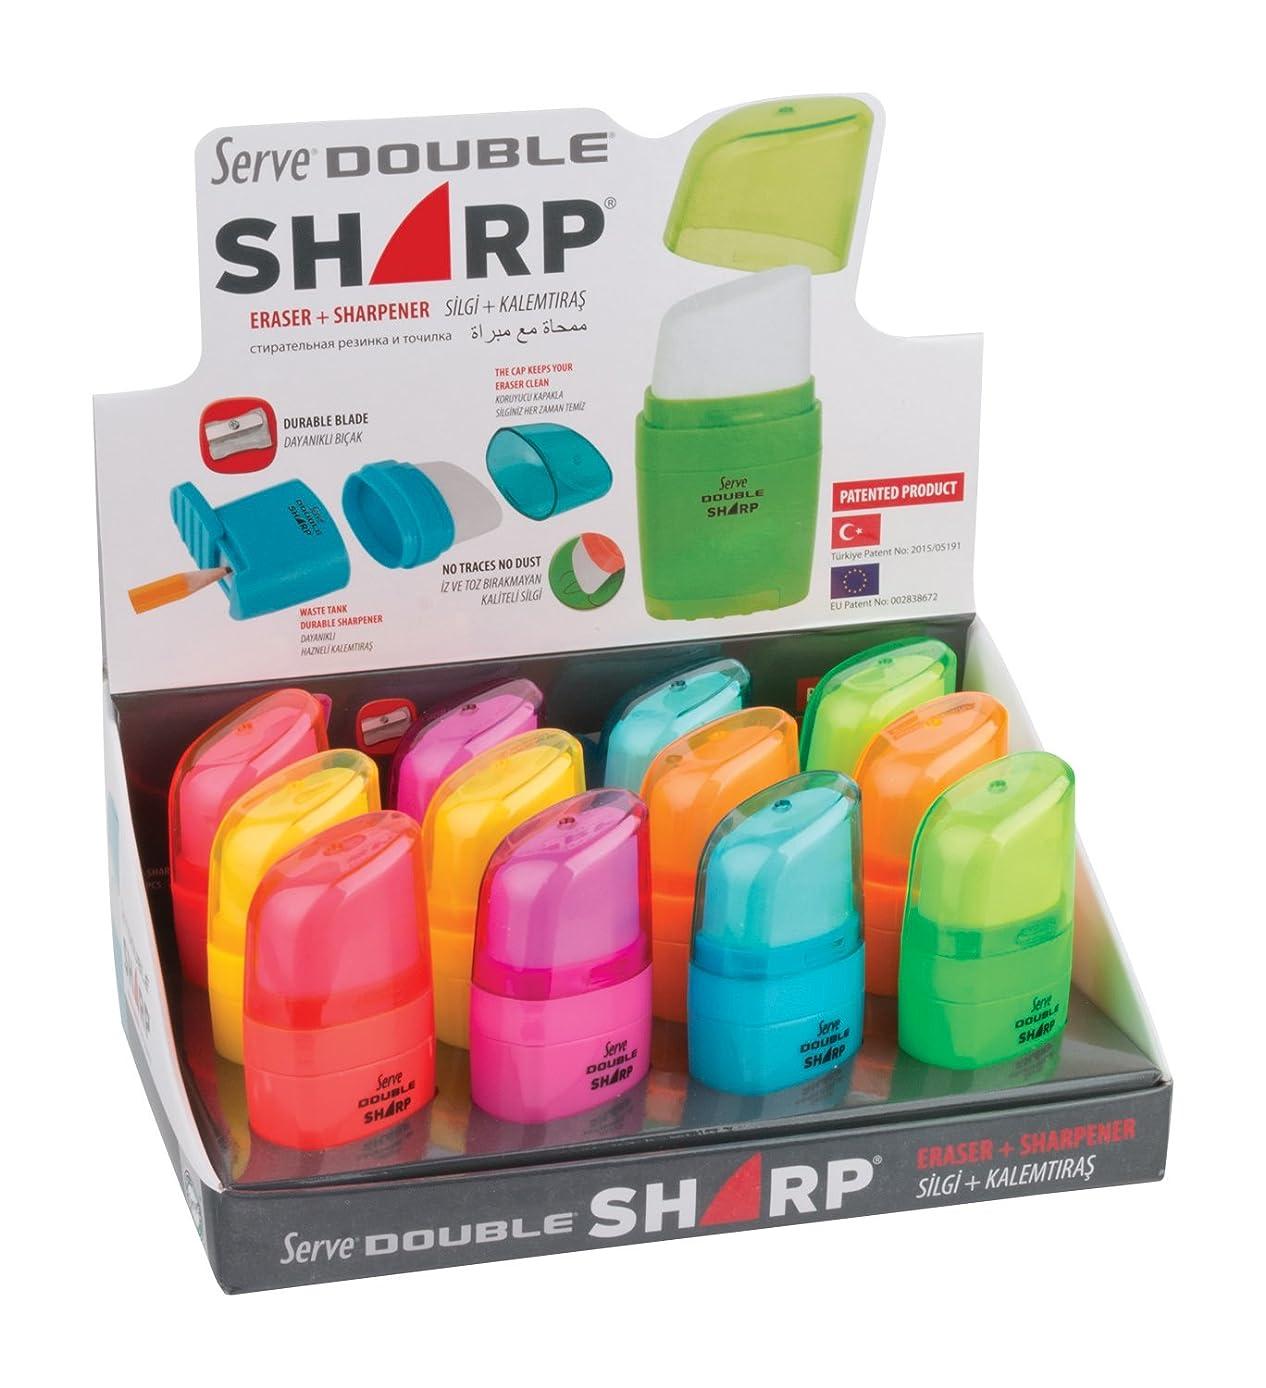 Serve SV D. SHARP1?2KTFR Double Sharp Eraser & Sharpener in one Body, 12?pcs in paperbox Eraser & Sharpener in one Body Mix Fluorescent Colours